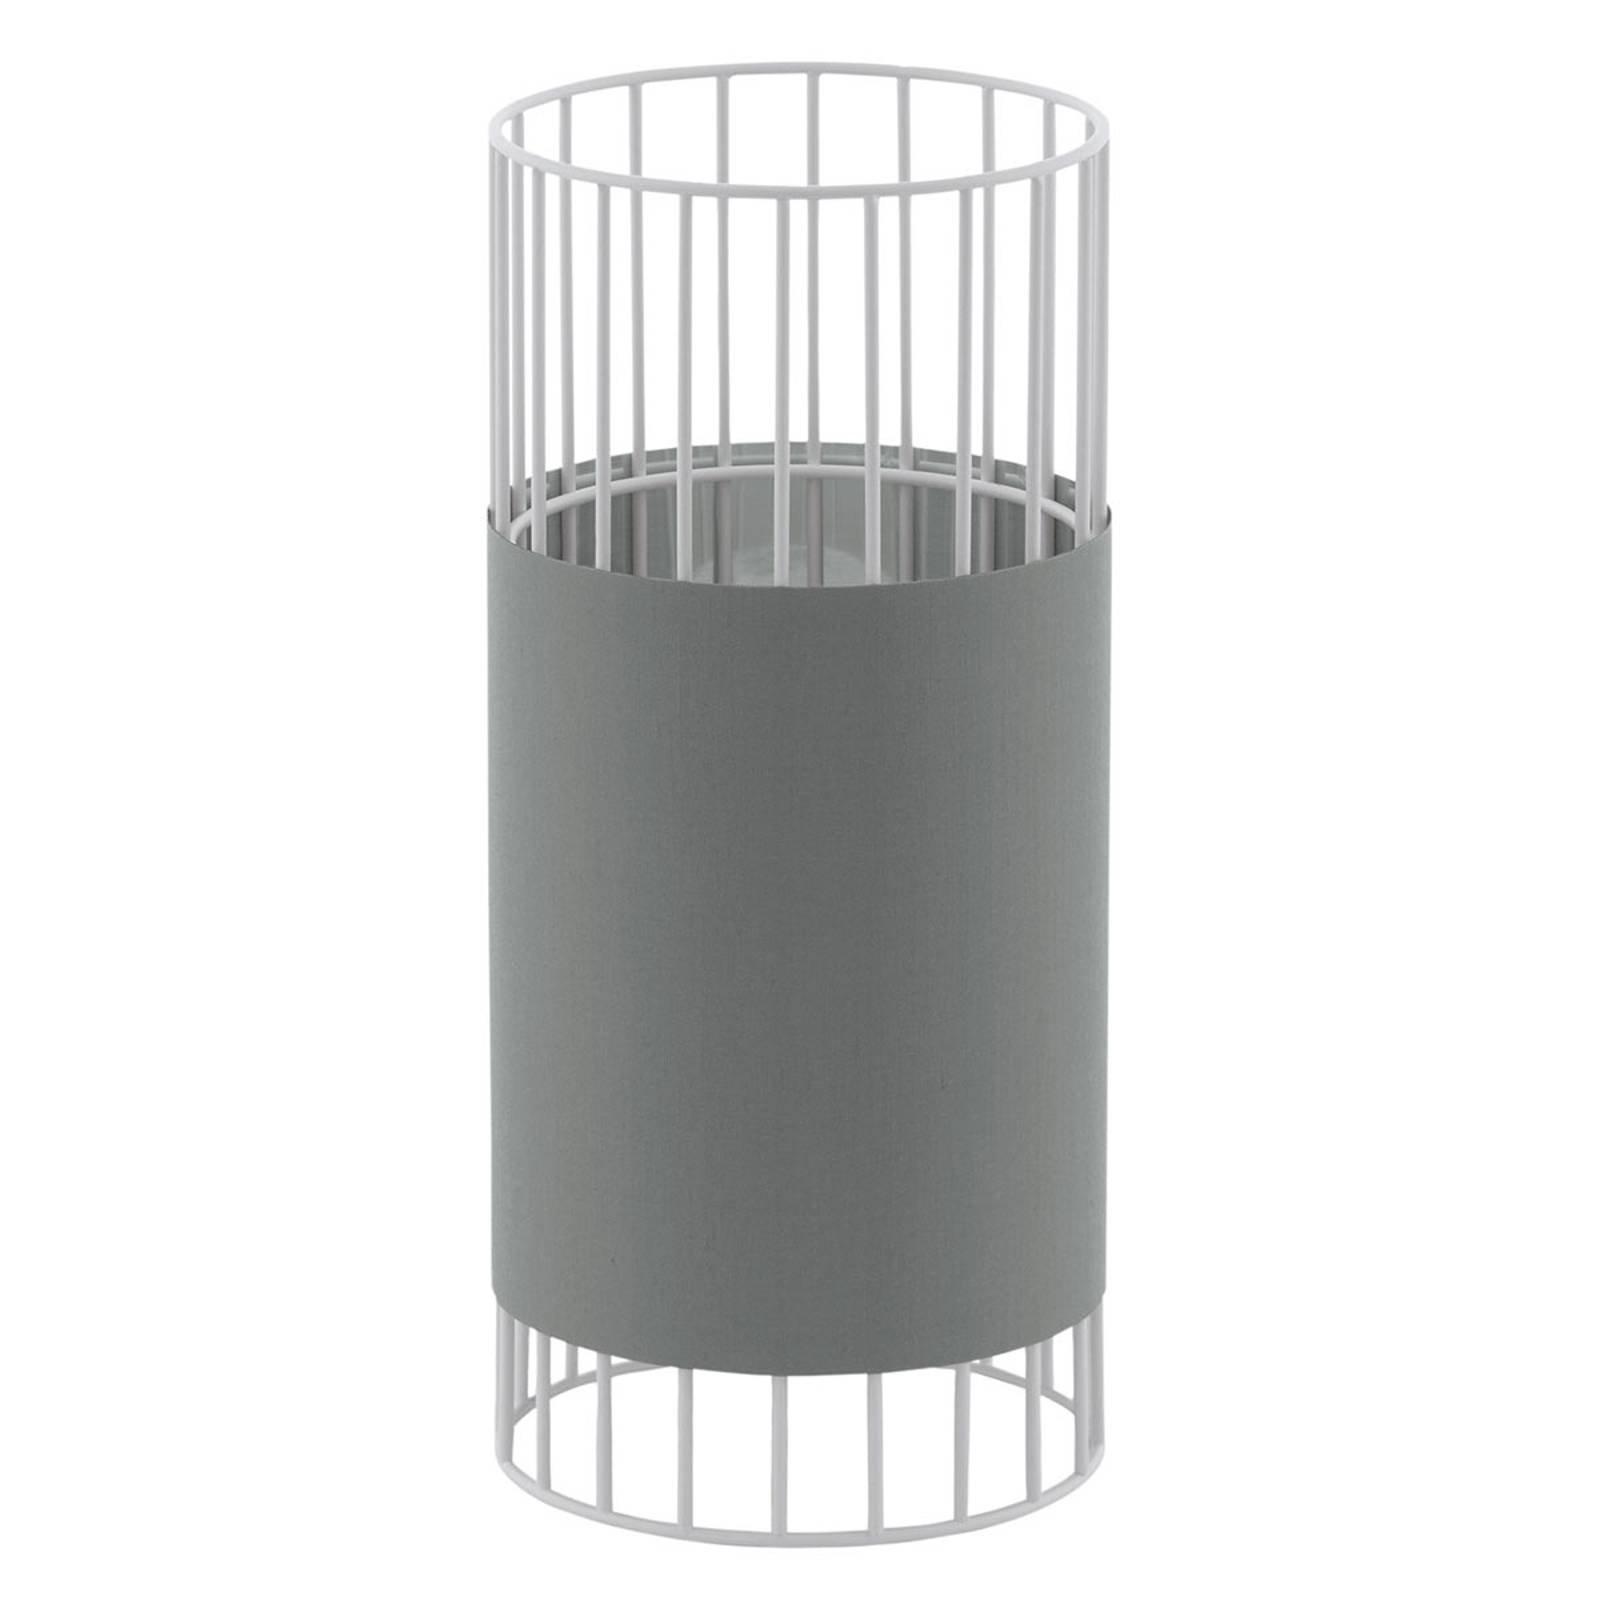 Bordlampe Norumbega med sylinderformet skjerm